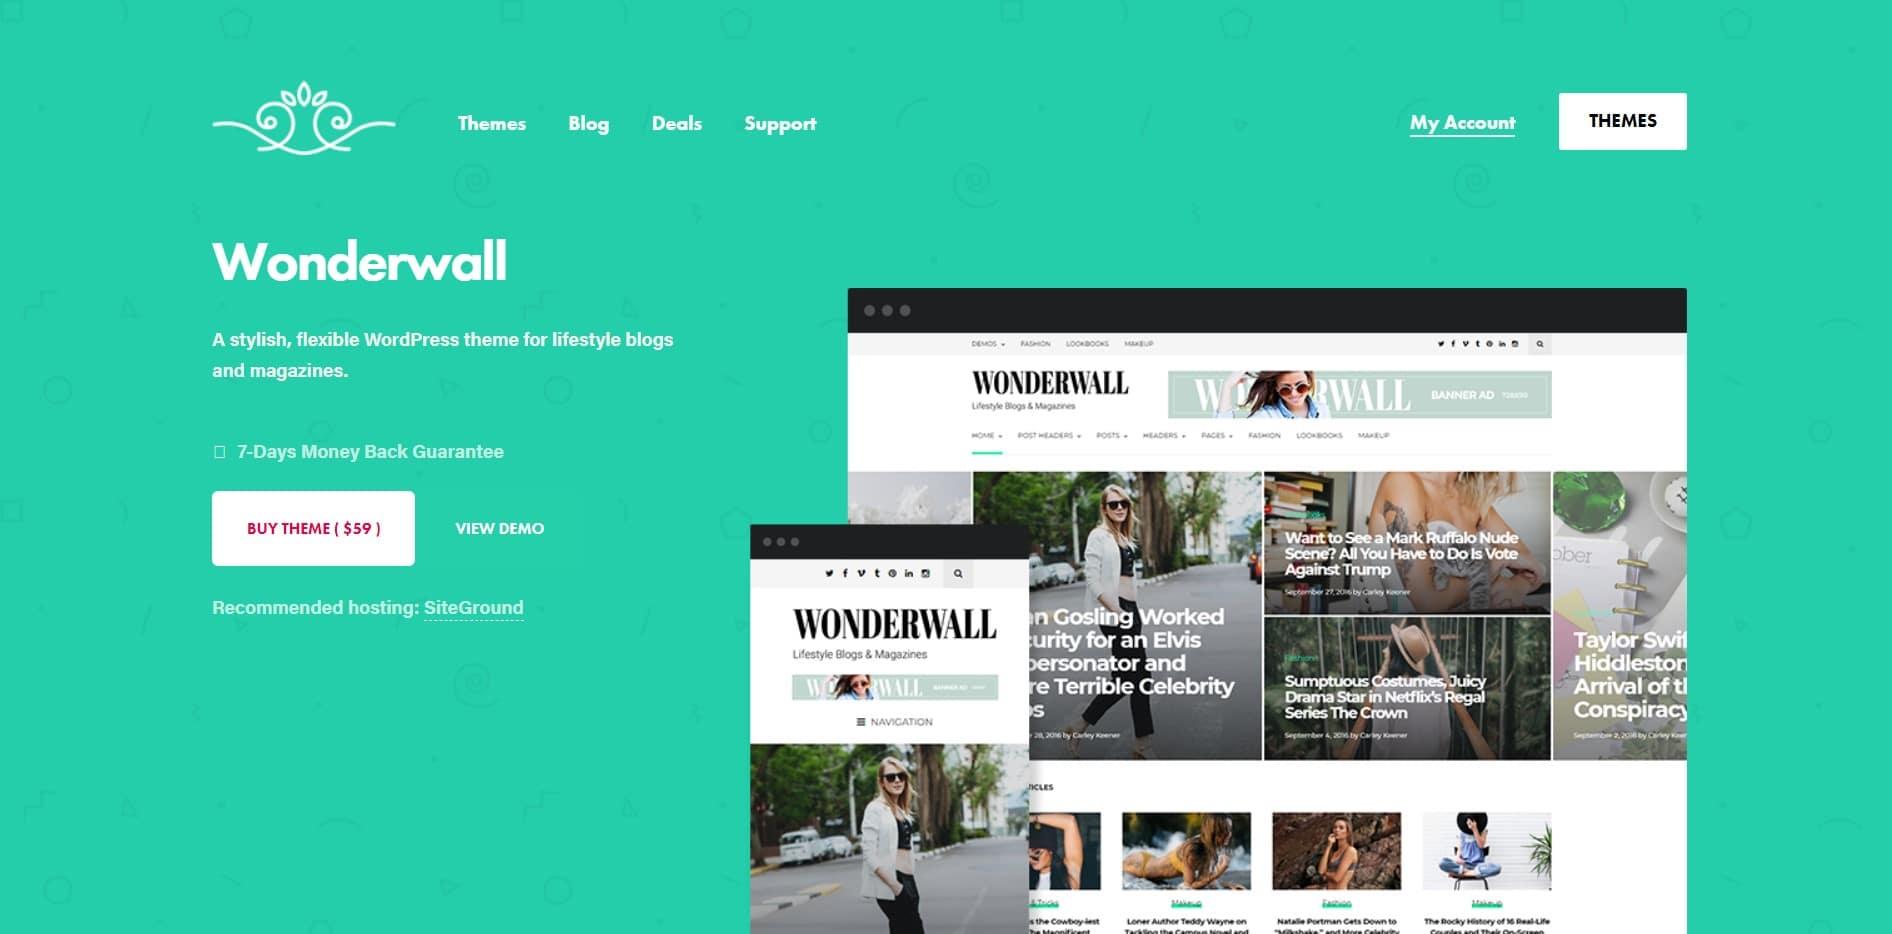 Wonderwall theme site image